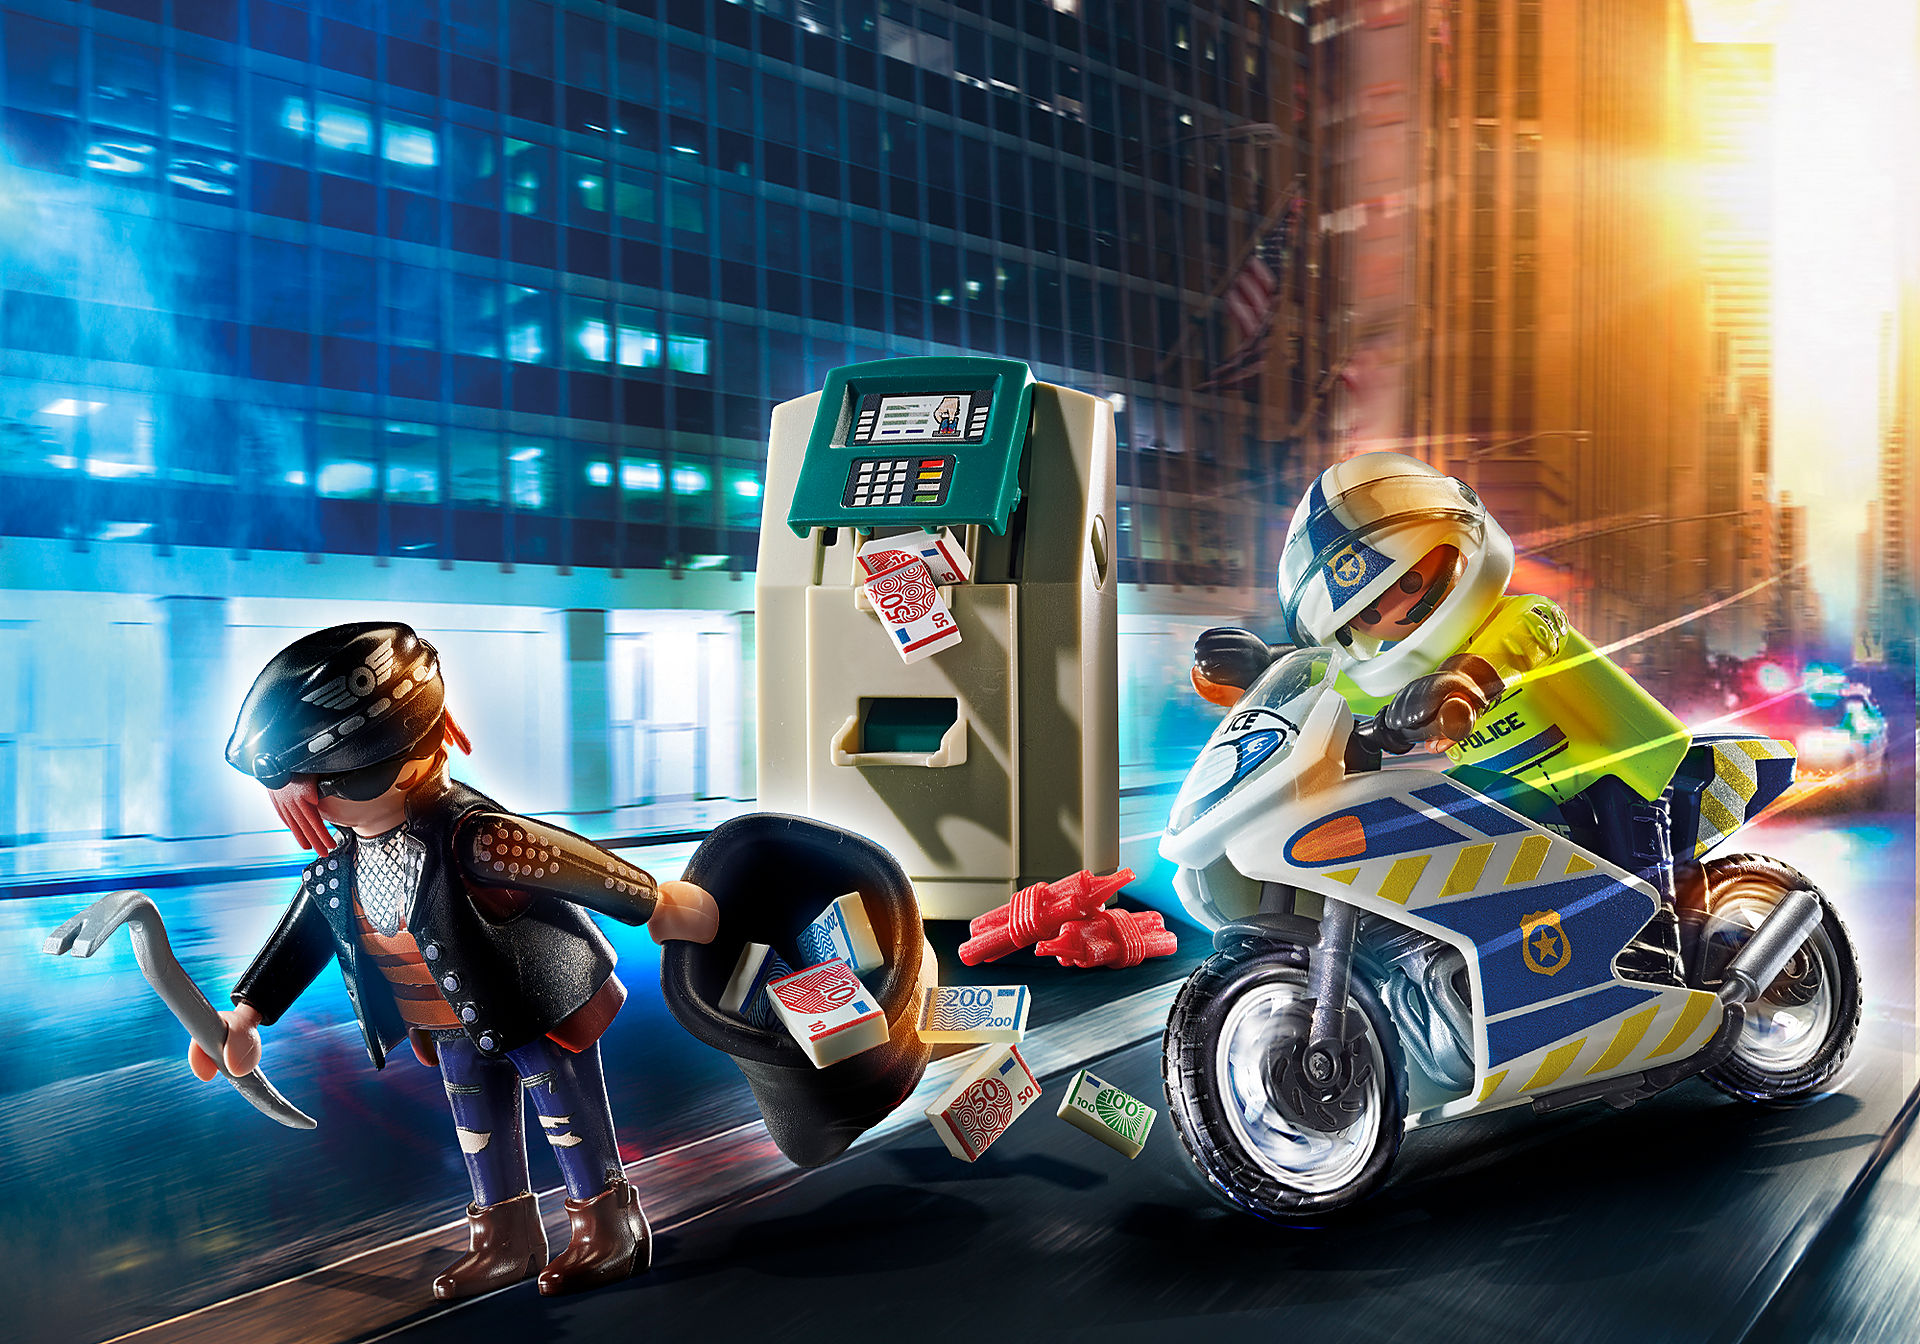 70572 Police Policier avec moto et voleur zoom image1